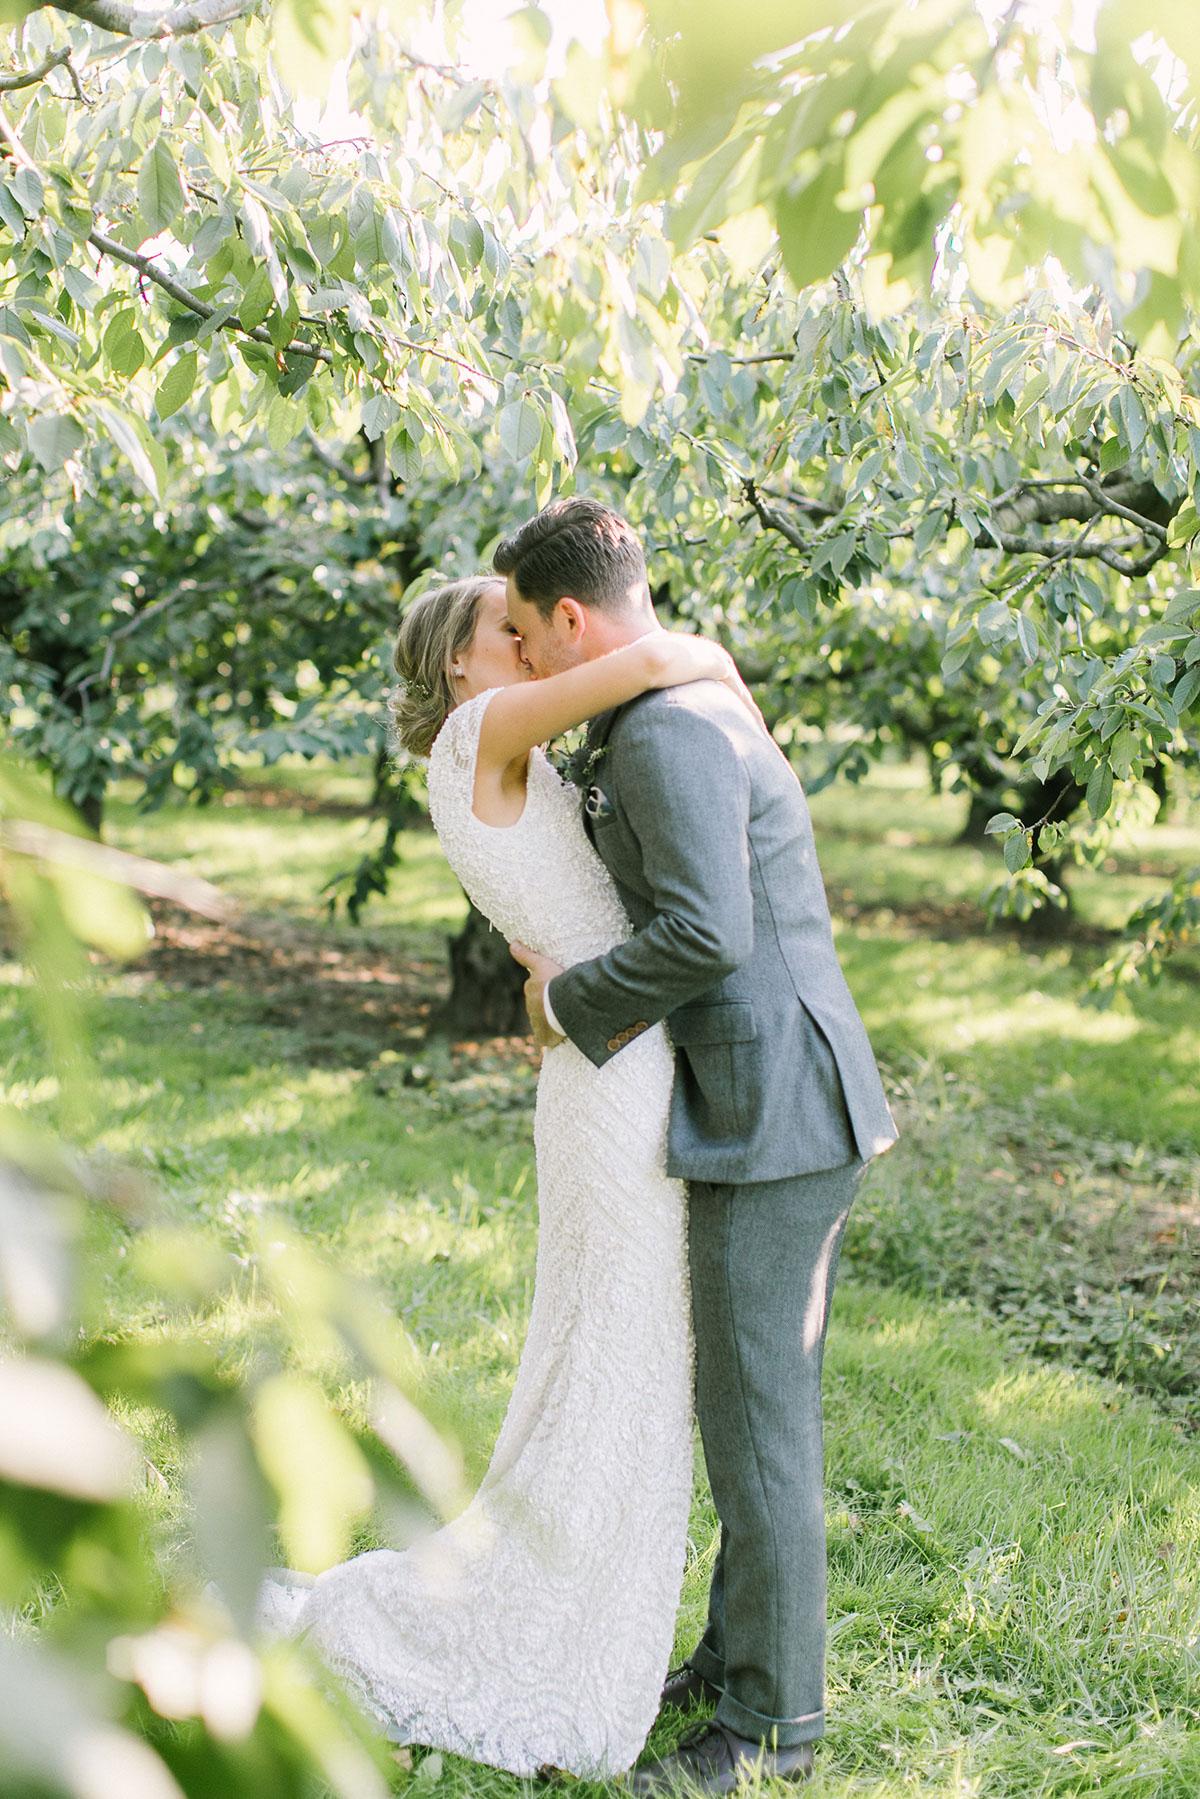 elizabeth-in-love-vineyard-bride-swish-list-cherry-avenue-farms-vineland-wedding-31.jpg